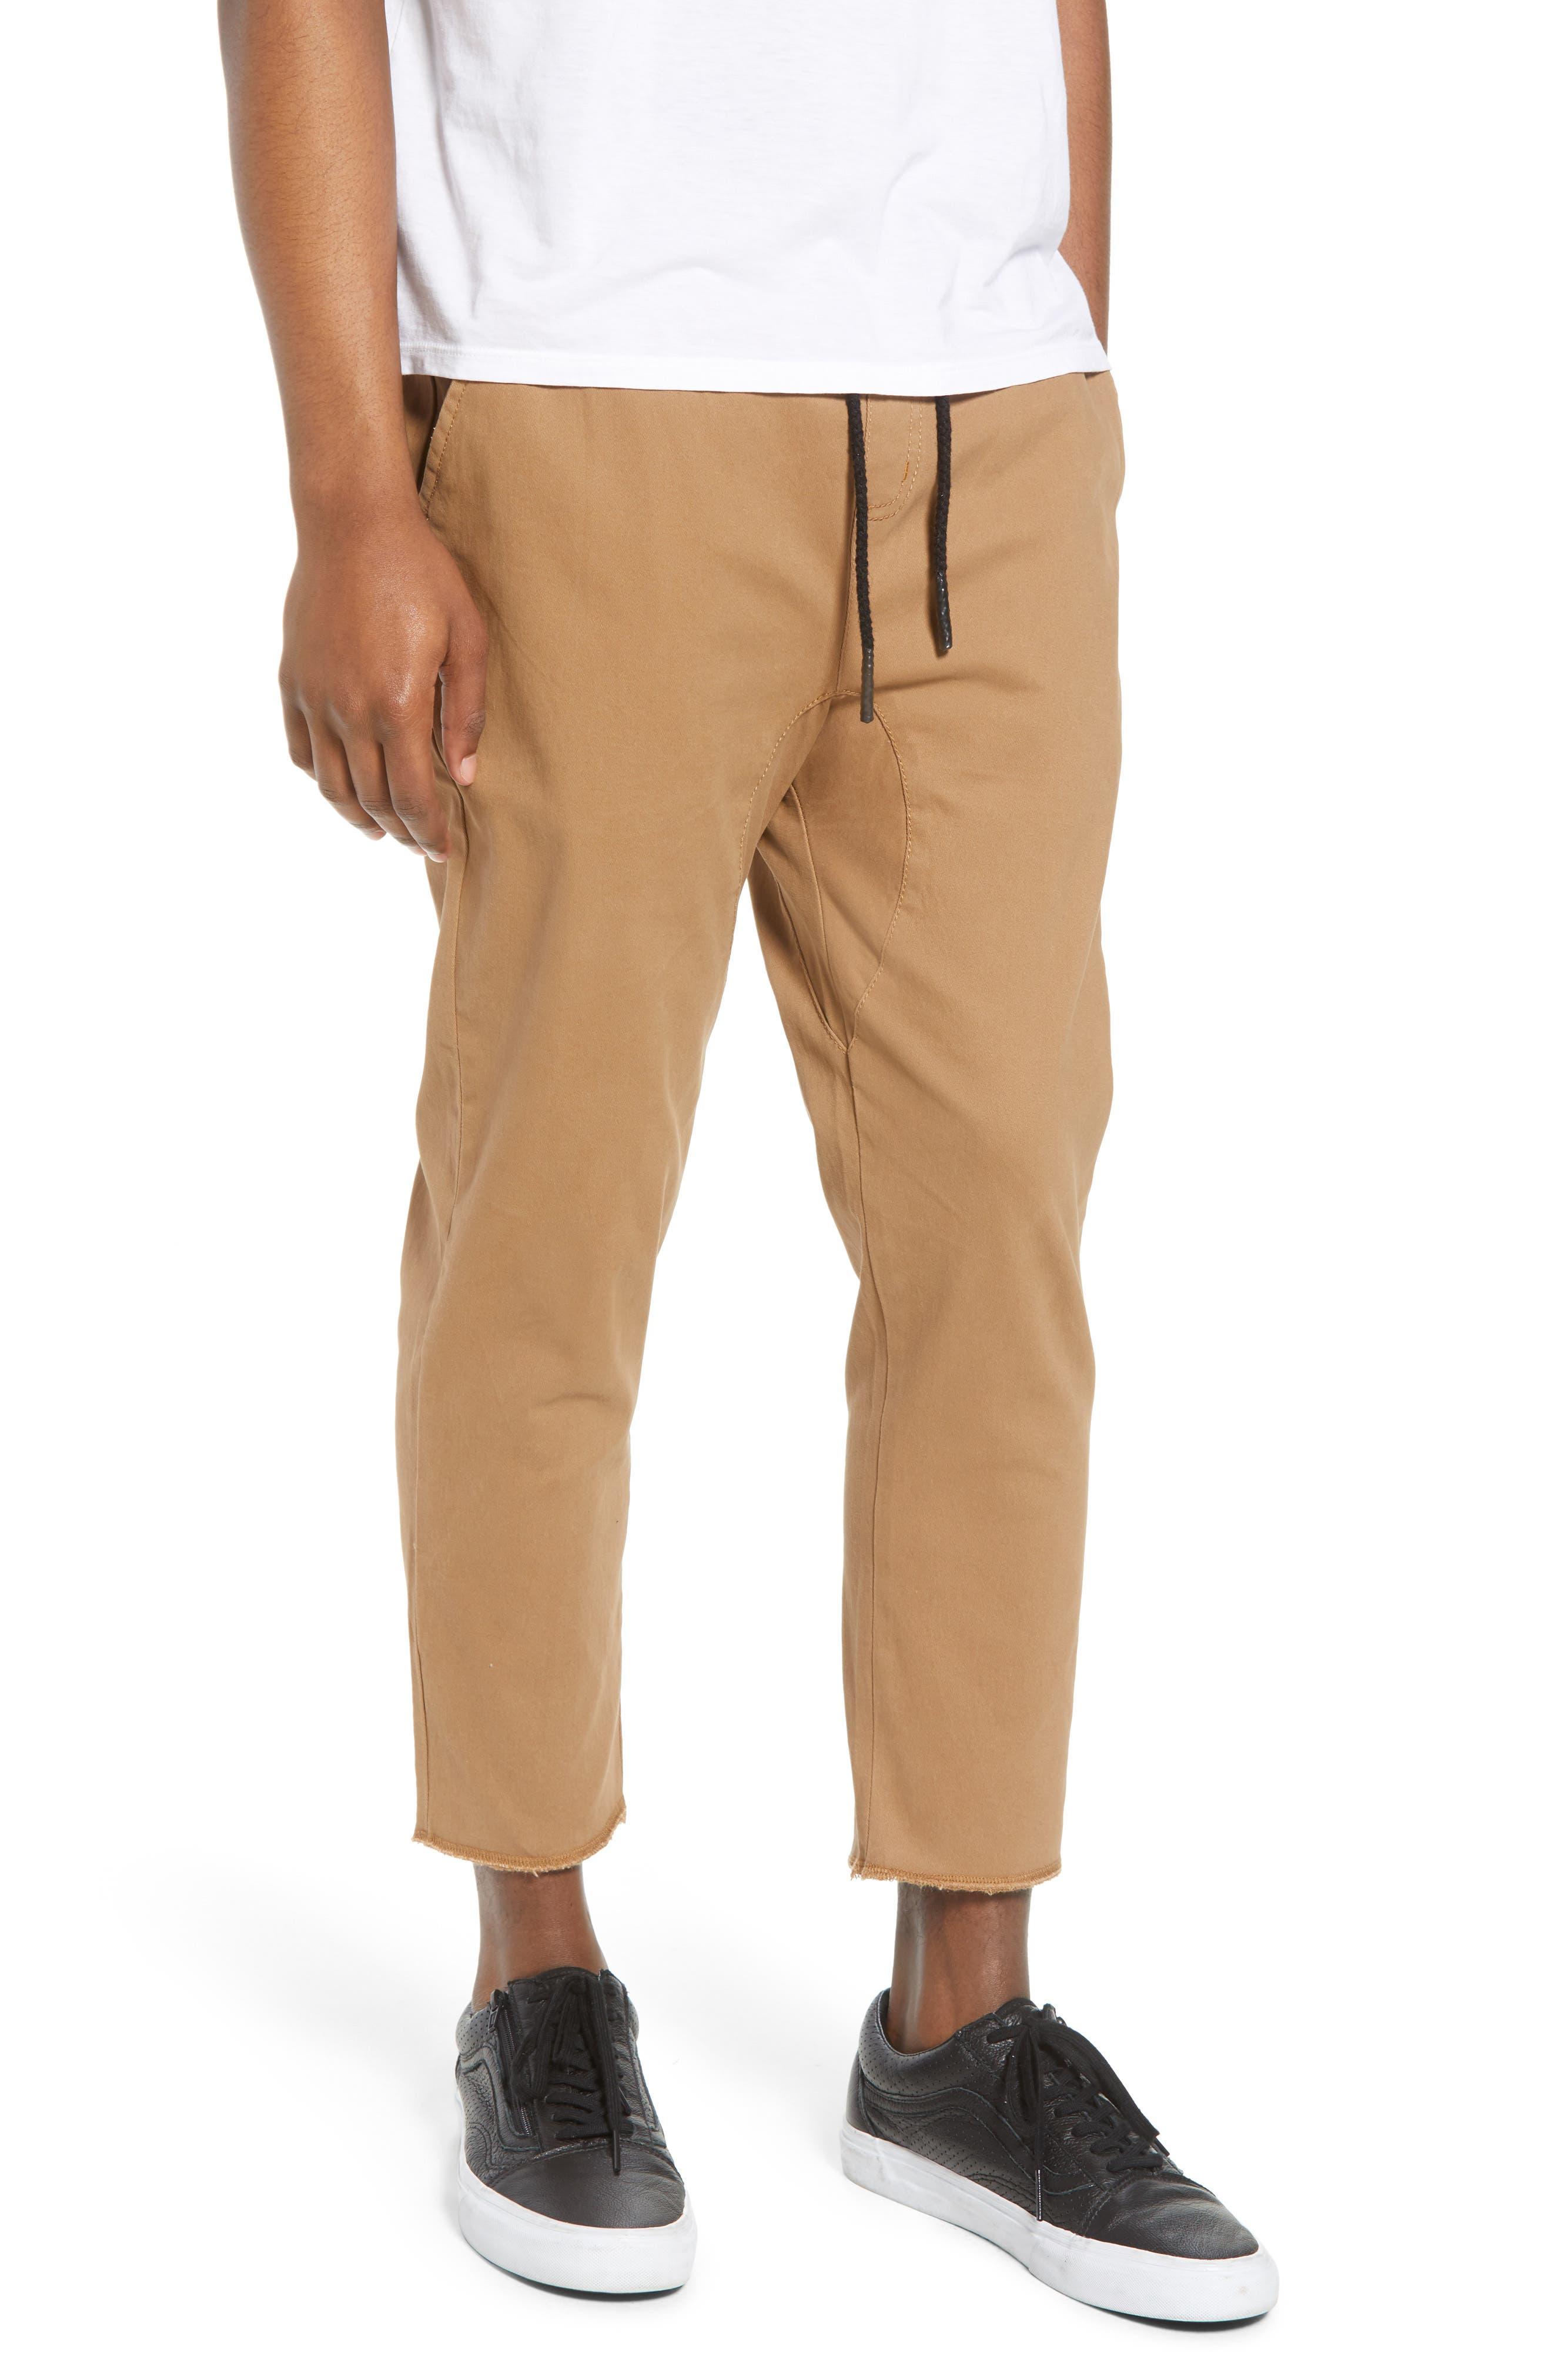 Lira Clothing Vacation Slim Fit Crop Pants